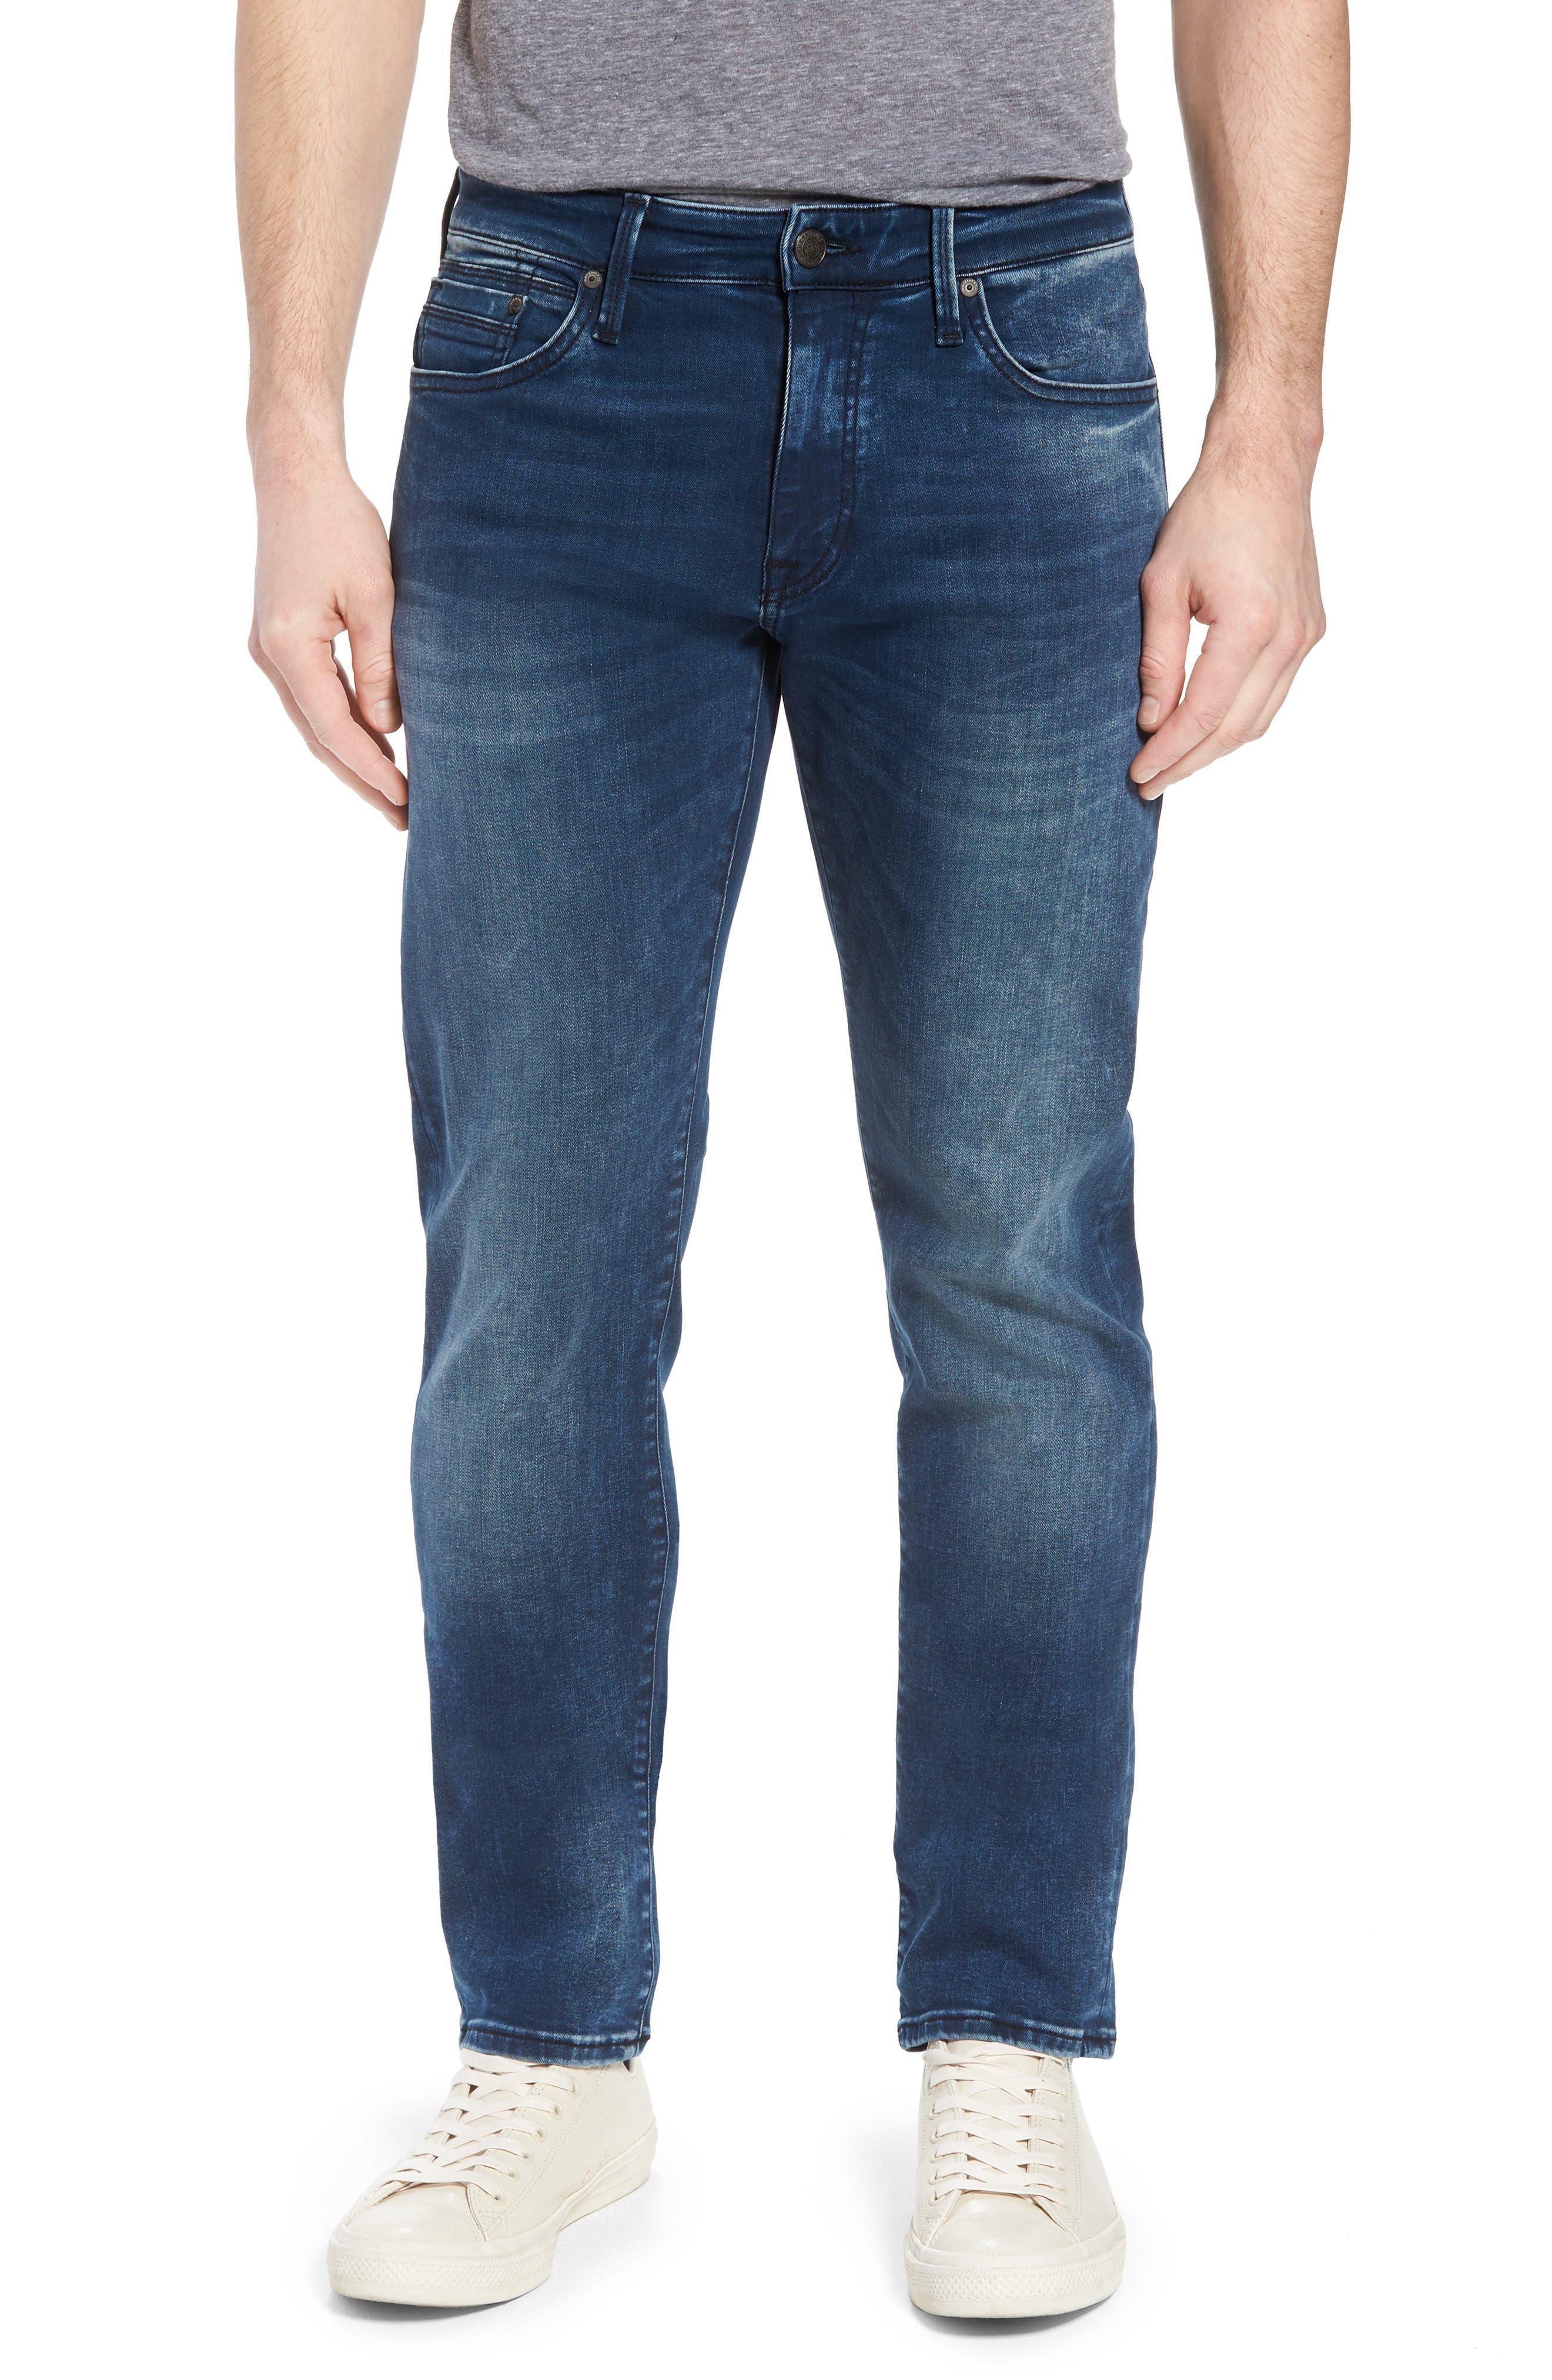 Marcus Slim Straight Leg Jeans,                         Main,                         color, Forest Blue Williamsburg